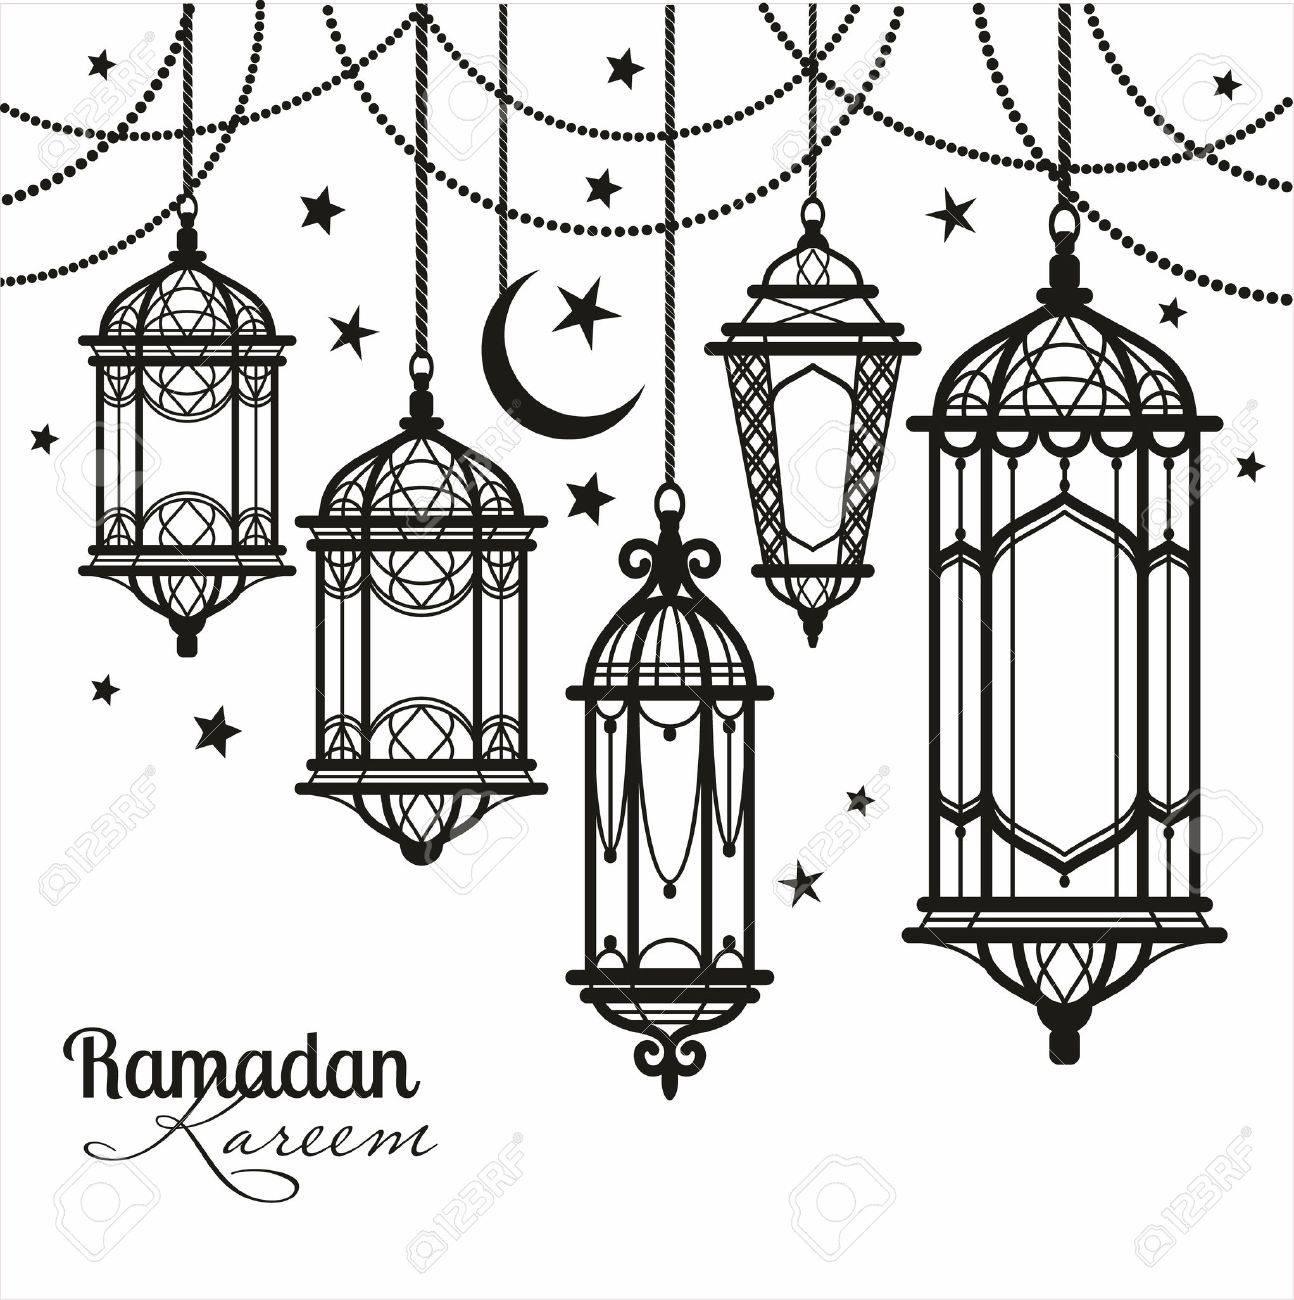 Ramadan Kareem. Islamic Background. Royalty Free Cliparts, Vectors ... for islamic lantern clipart  53kxo